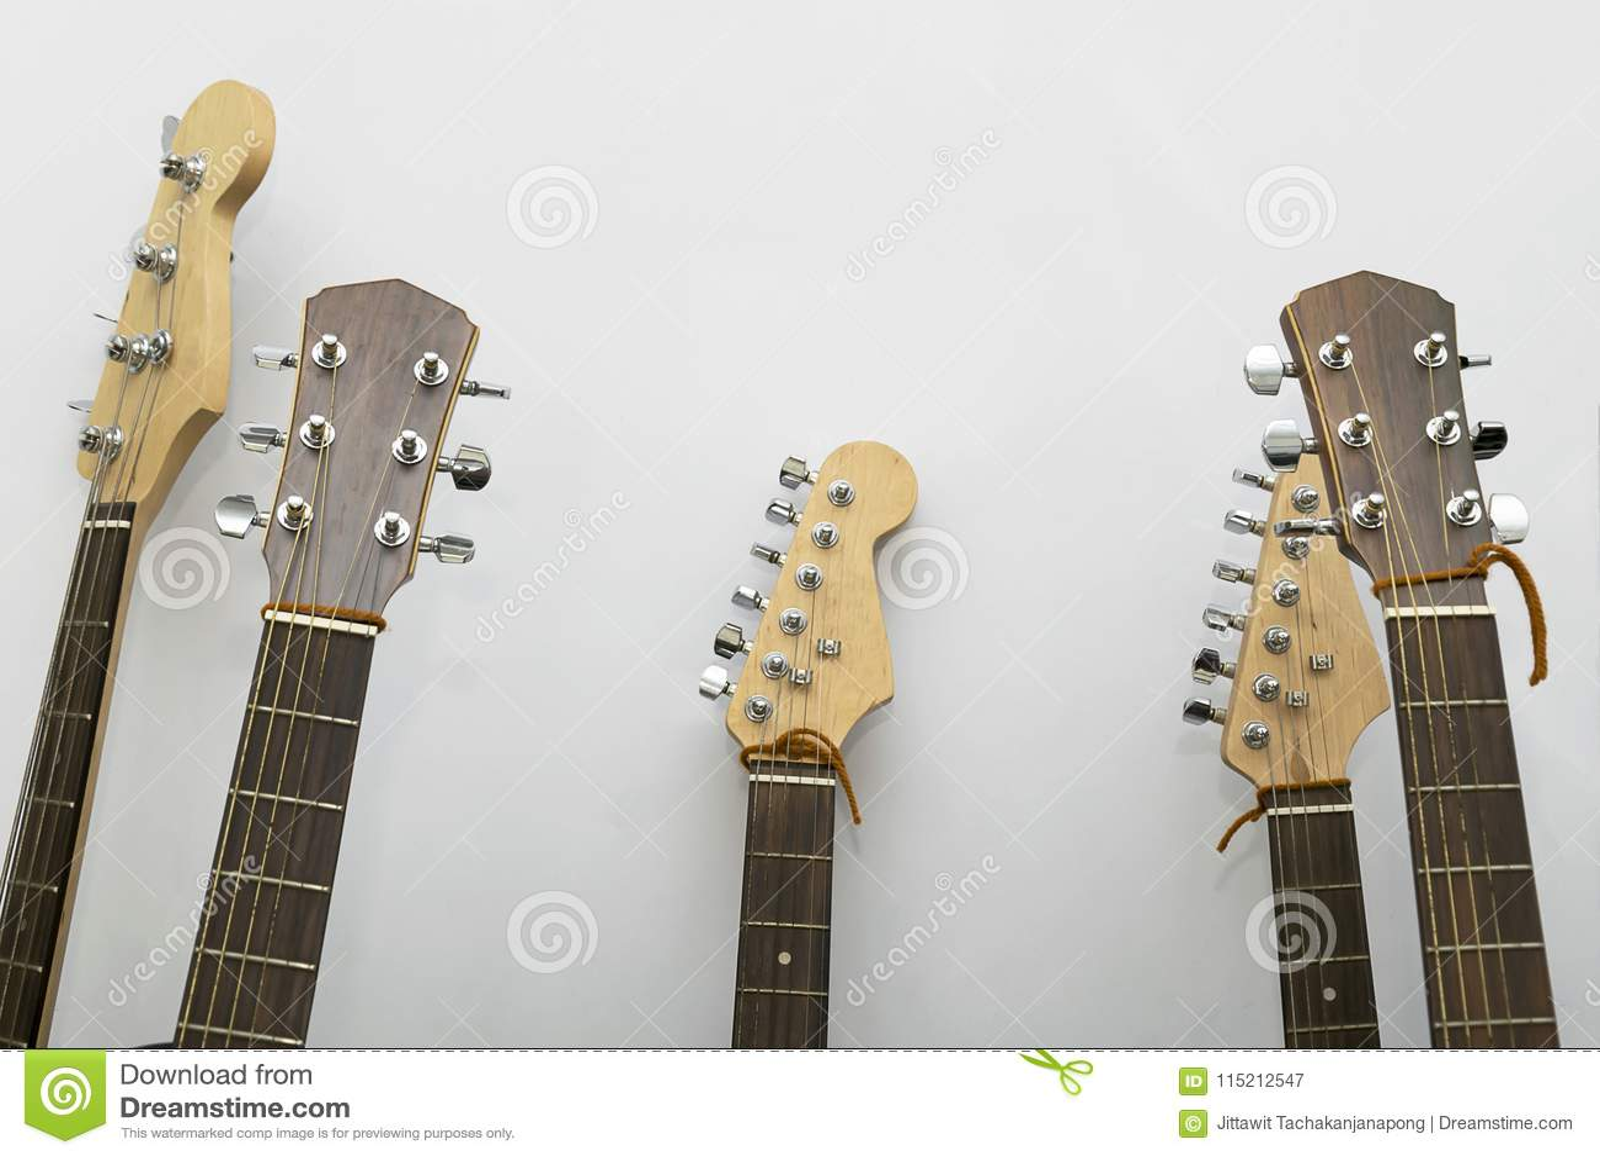 Guitar closeup in the studio